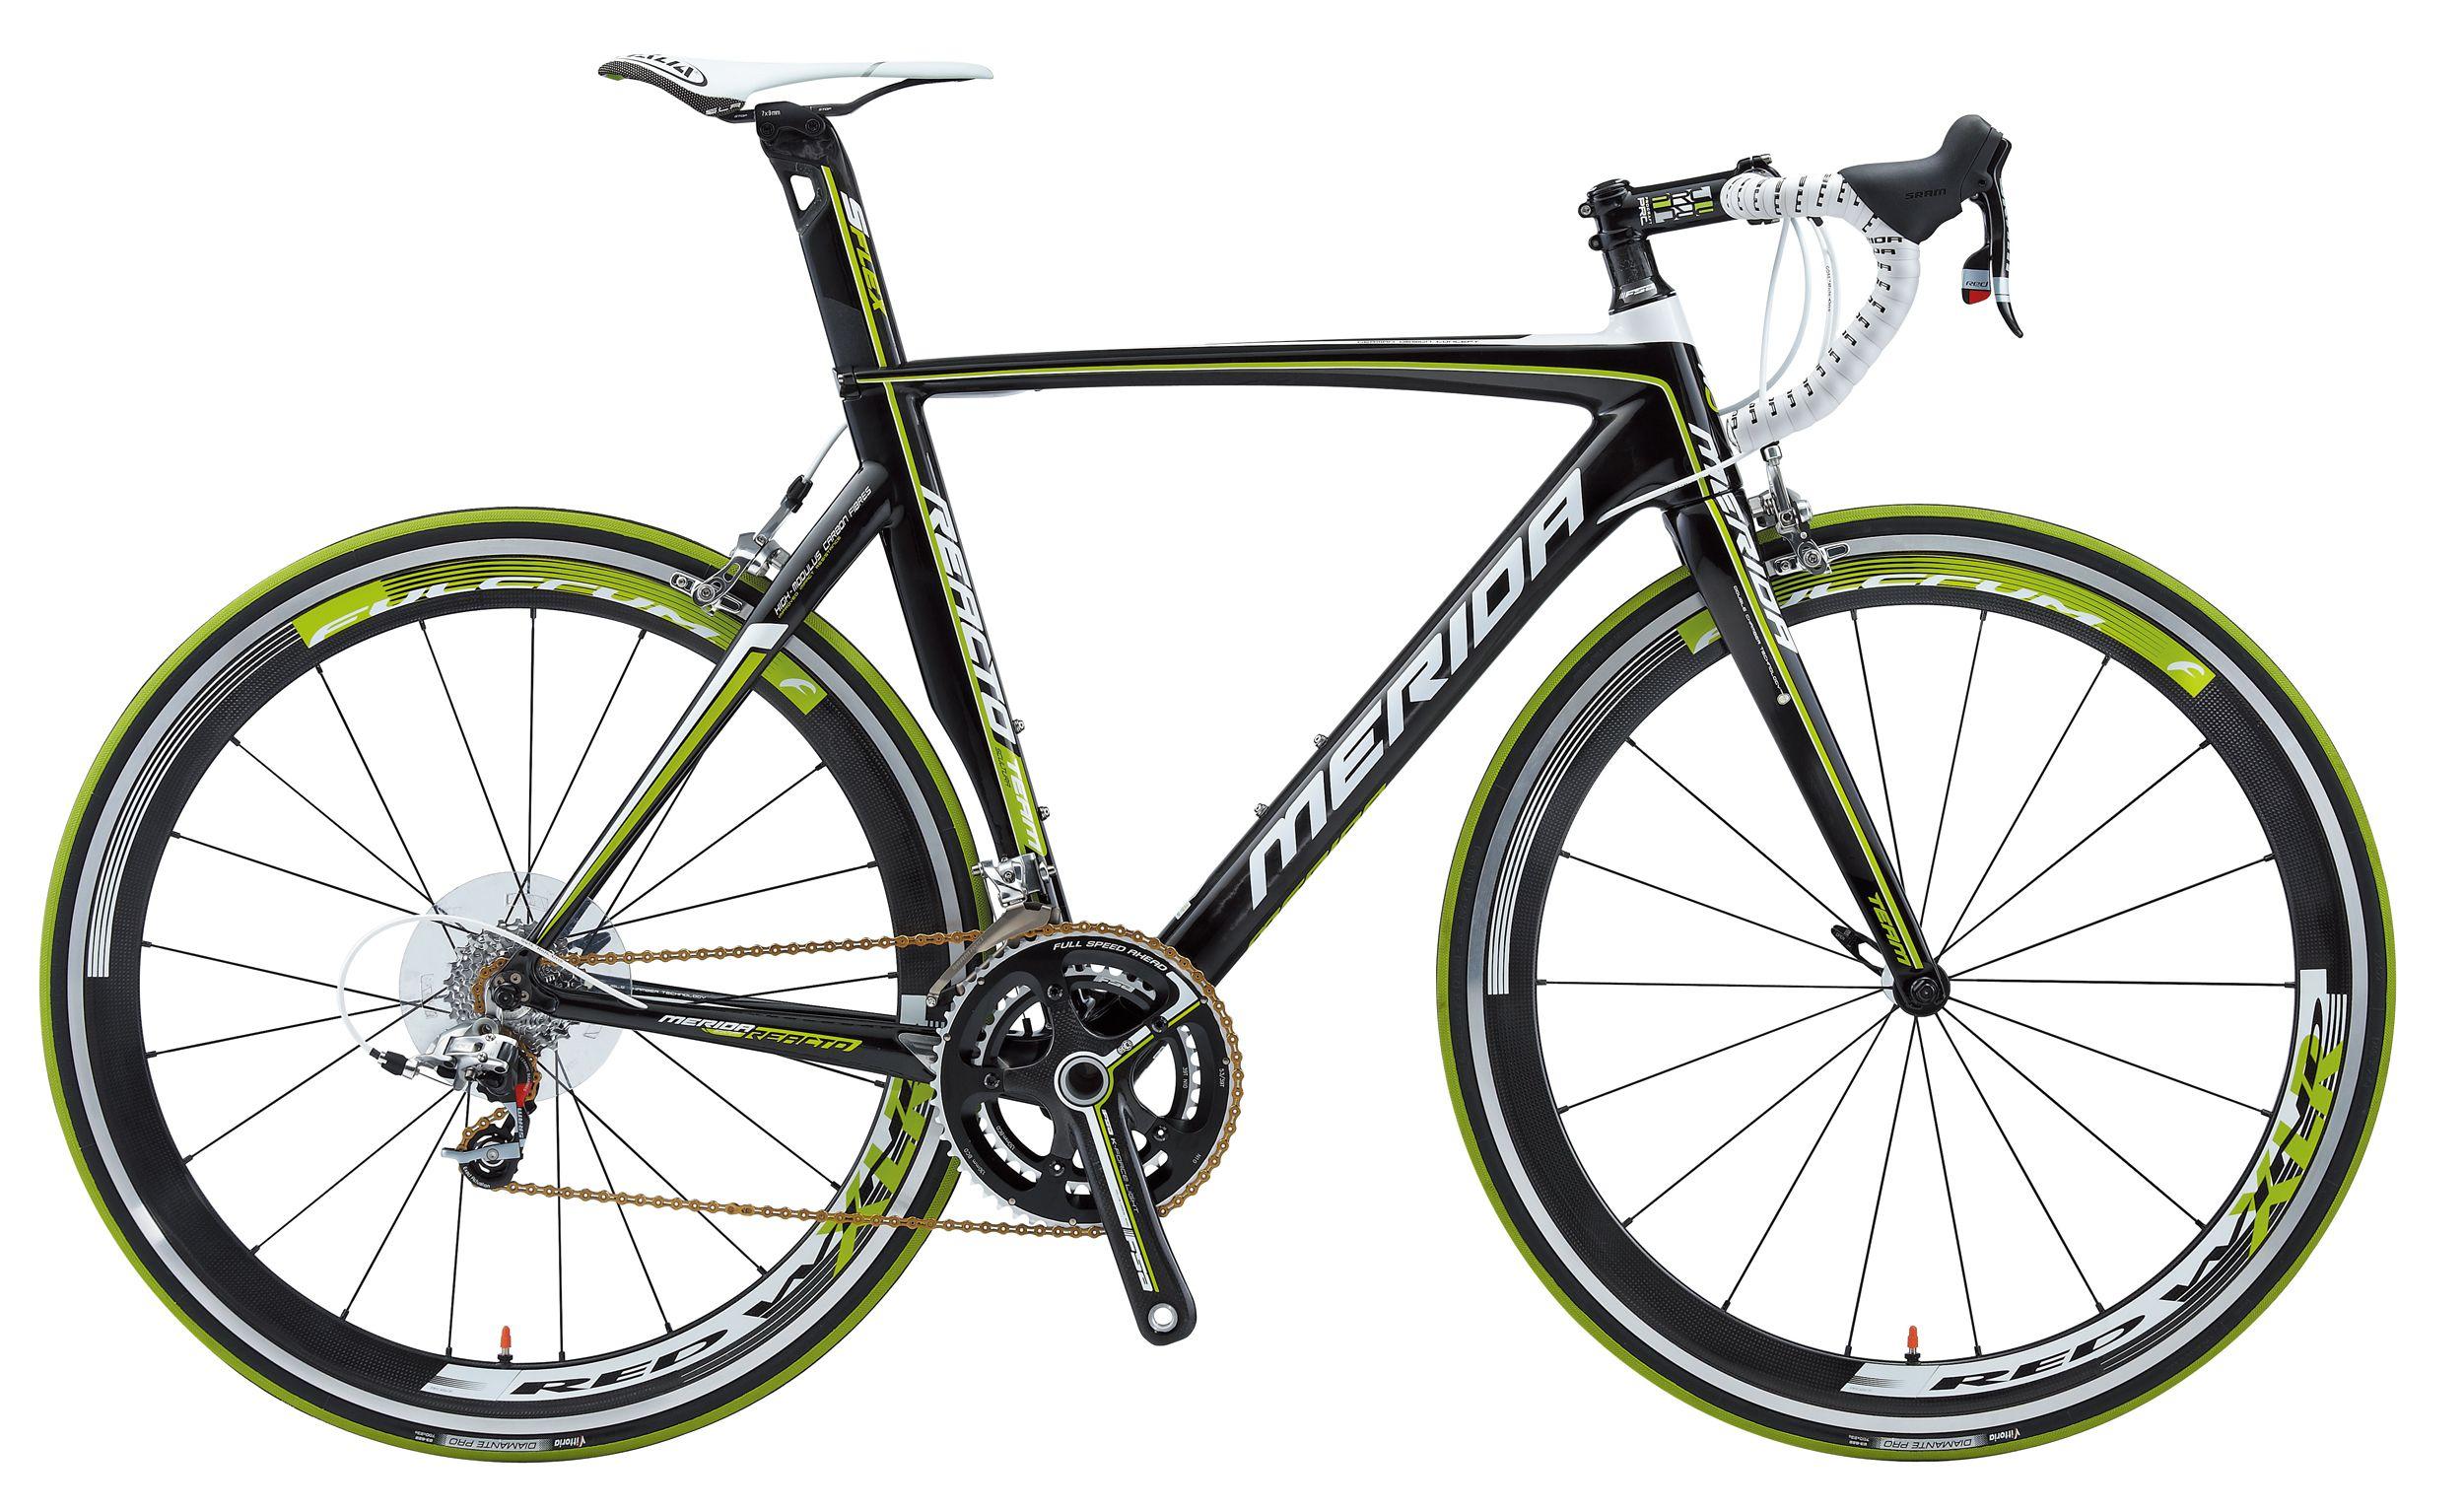 Merida Reacto Team 20 Roadbike Road Bike Cycling Road Bikes